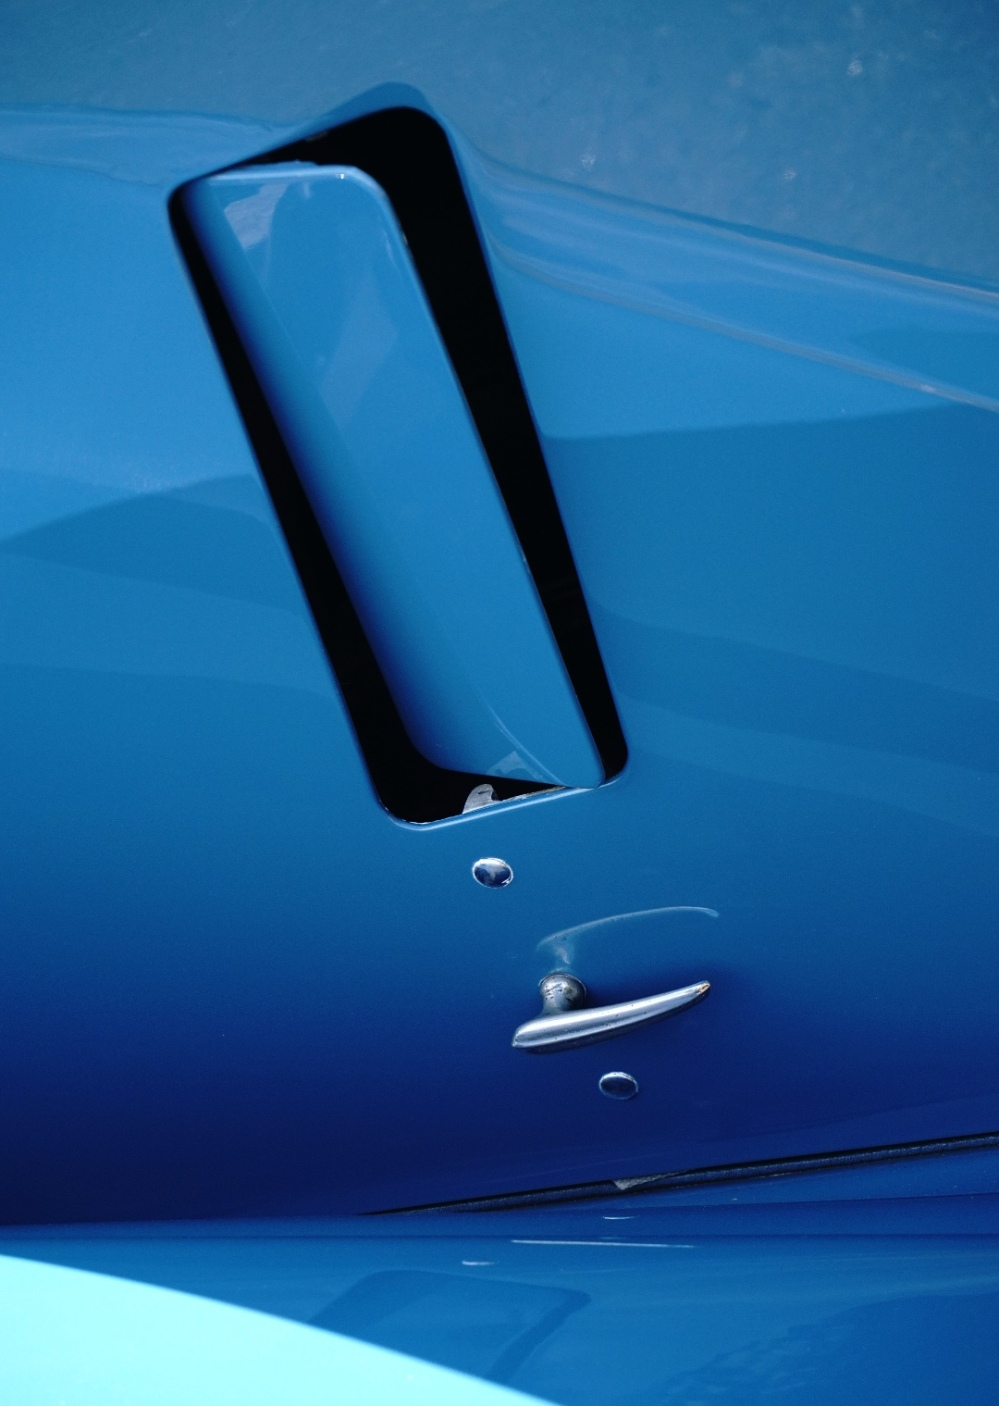 Rolls Royce Wraith engine vent